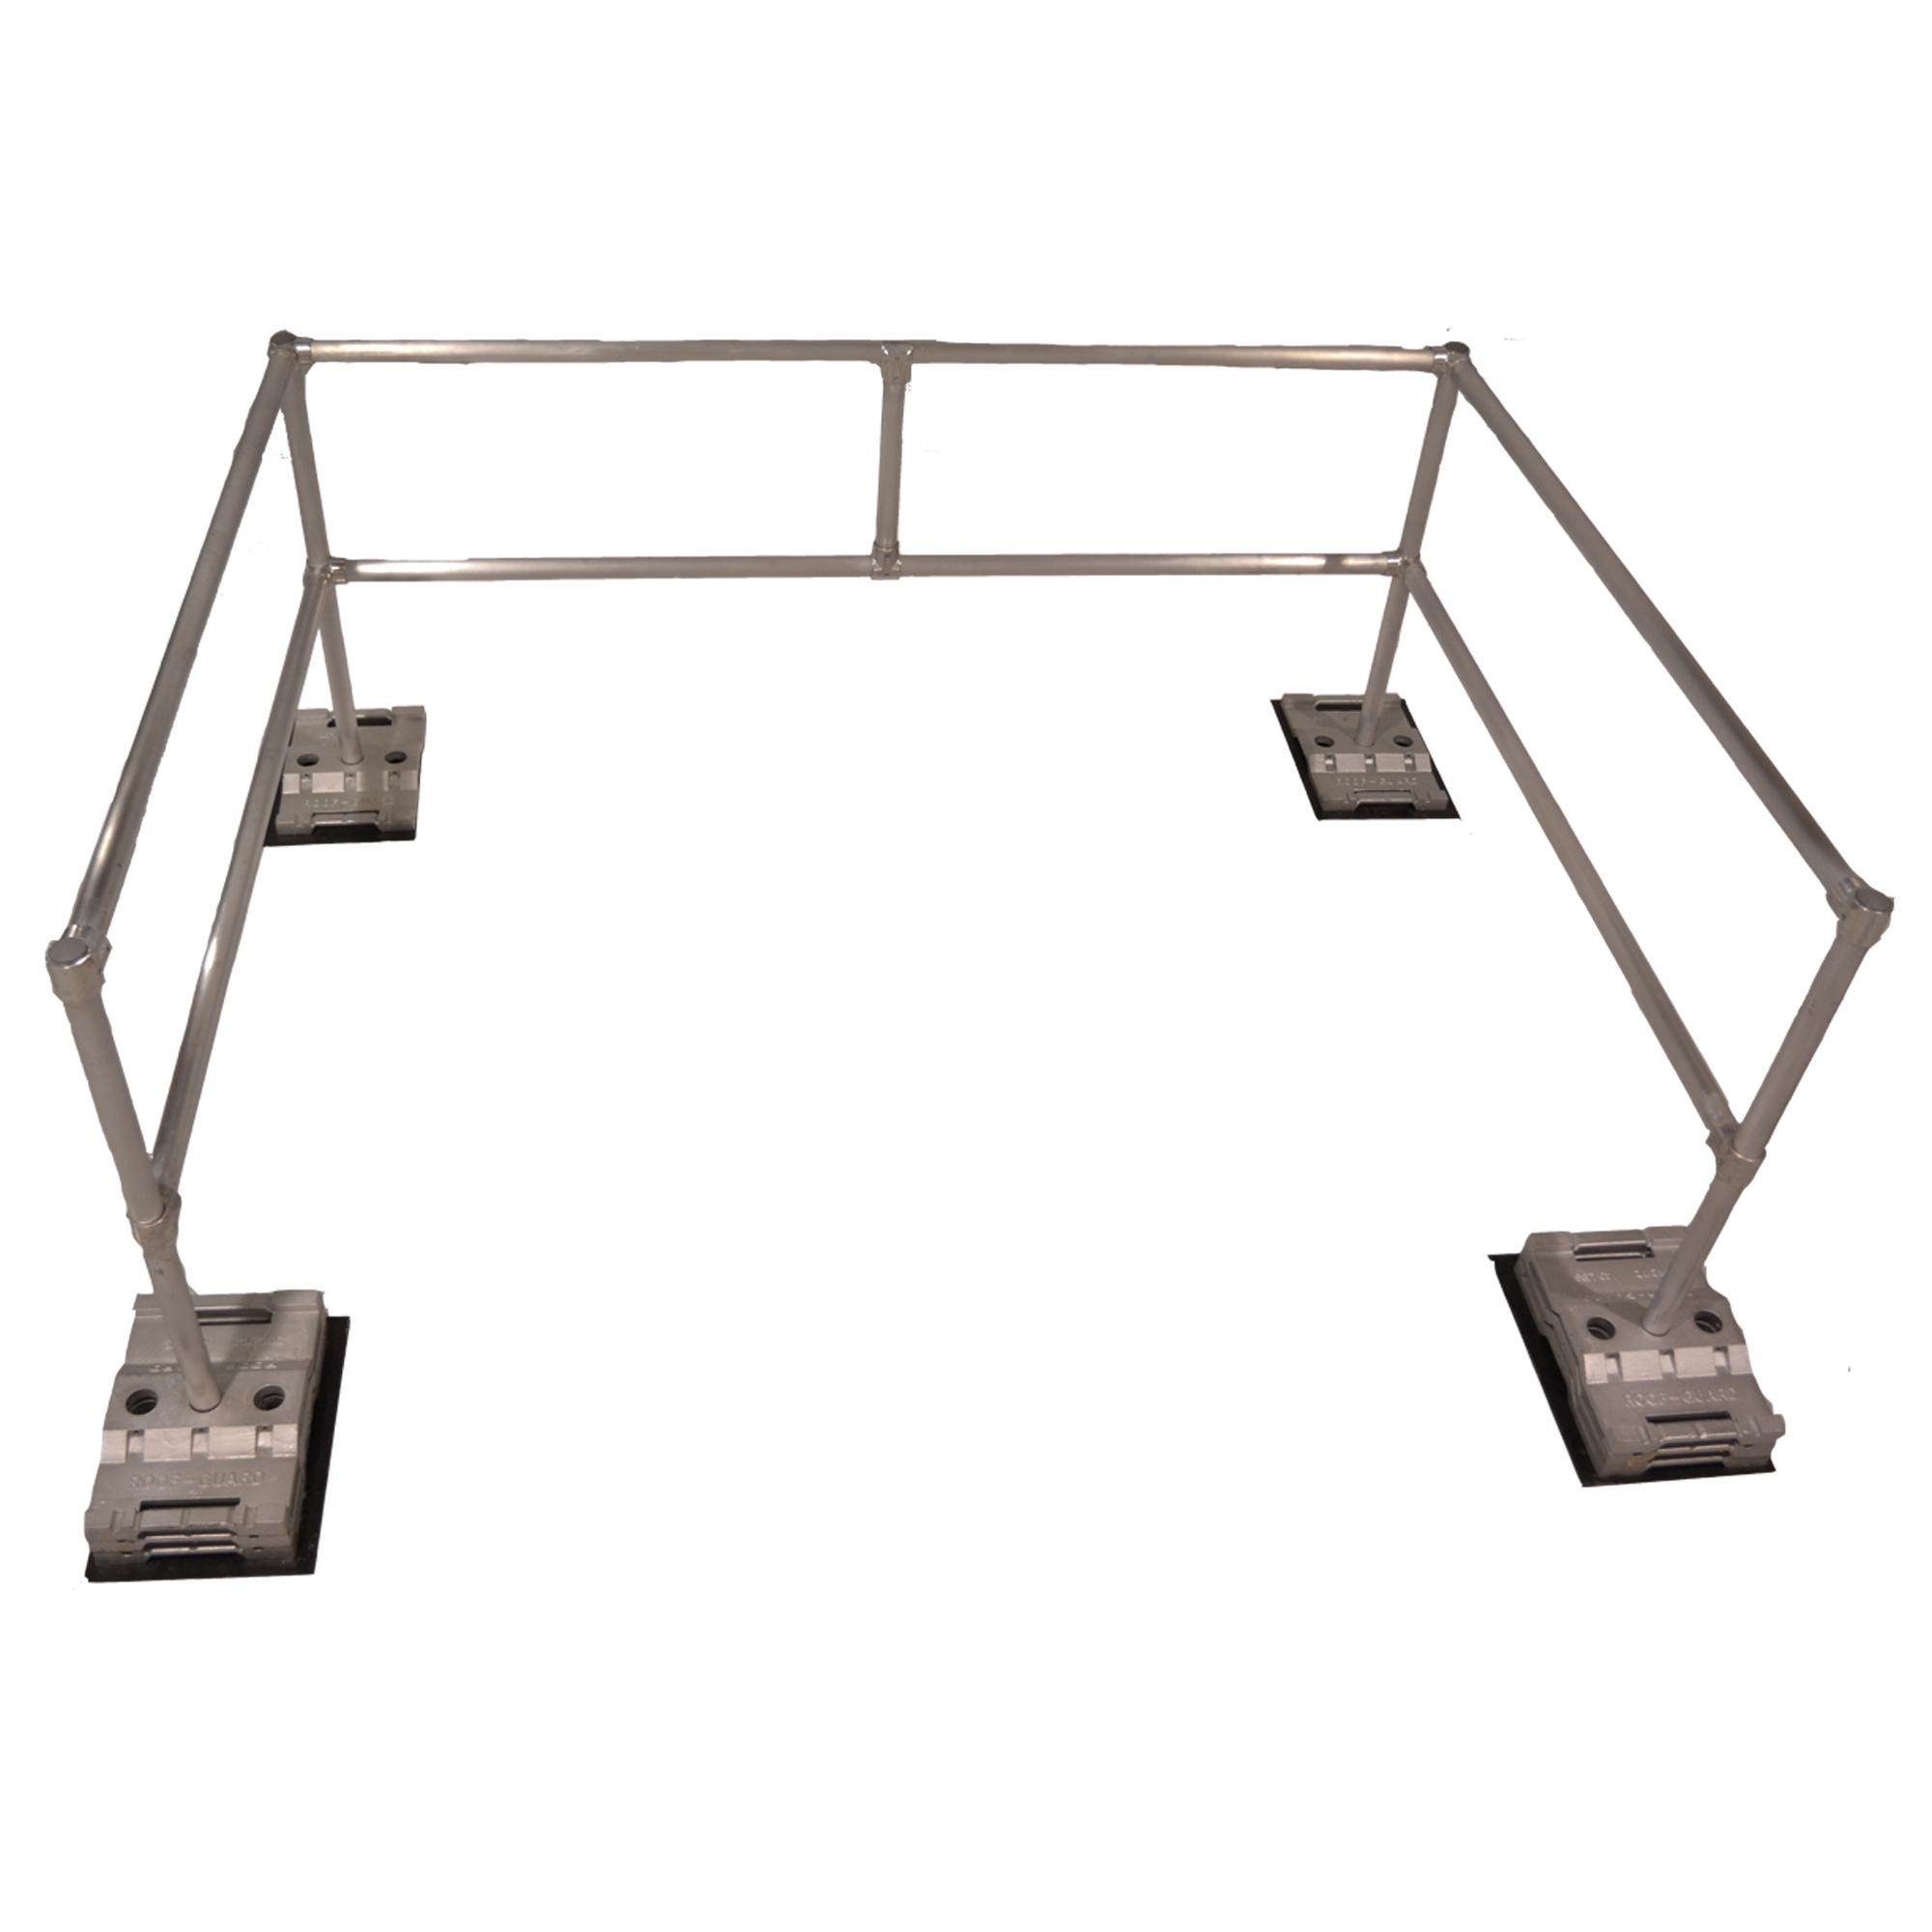 Rooftop Guardrail 9 Foot Kit